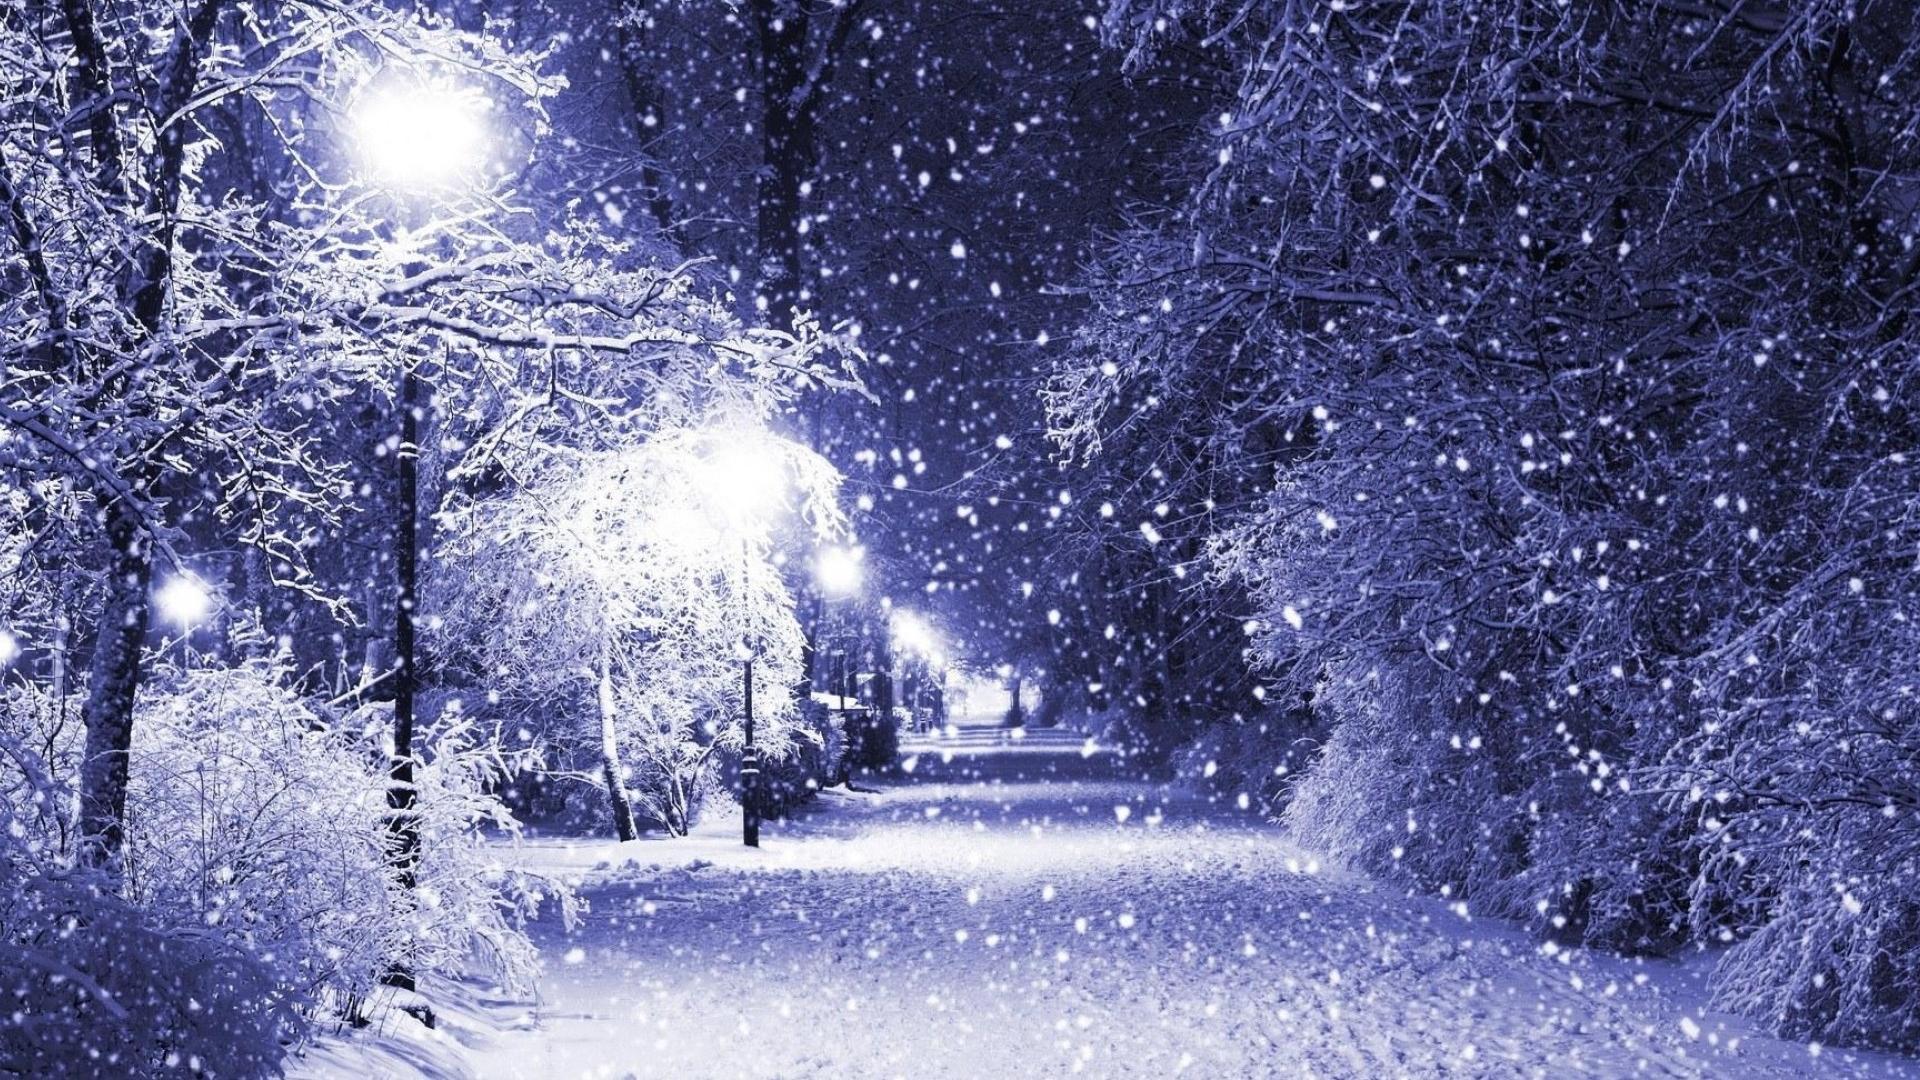 winter night snow landscape Wallpaper High definition Wallpapers 1920x1080